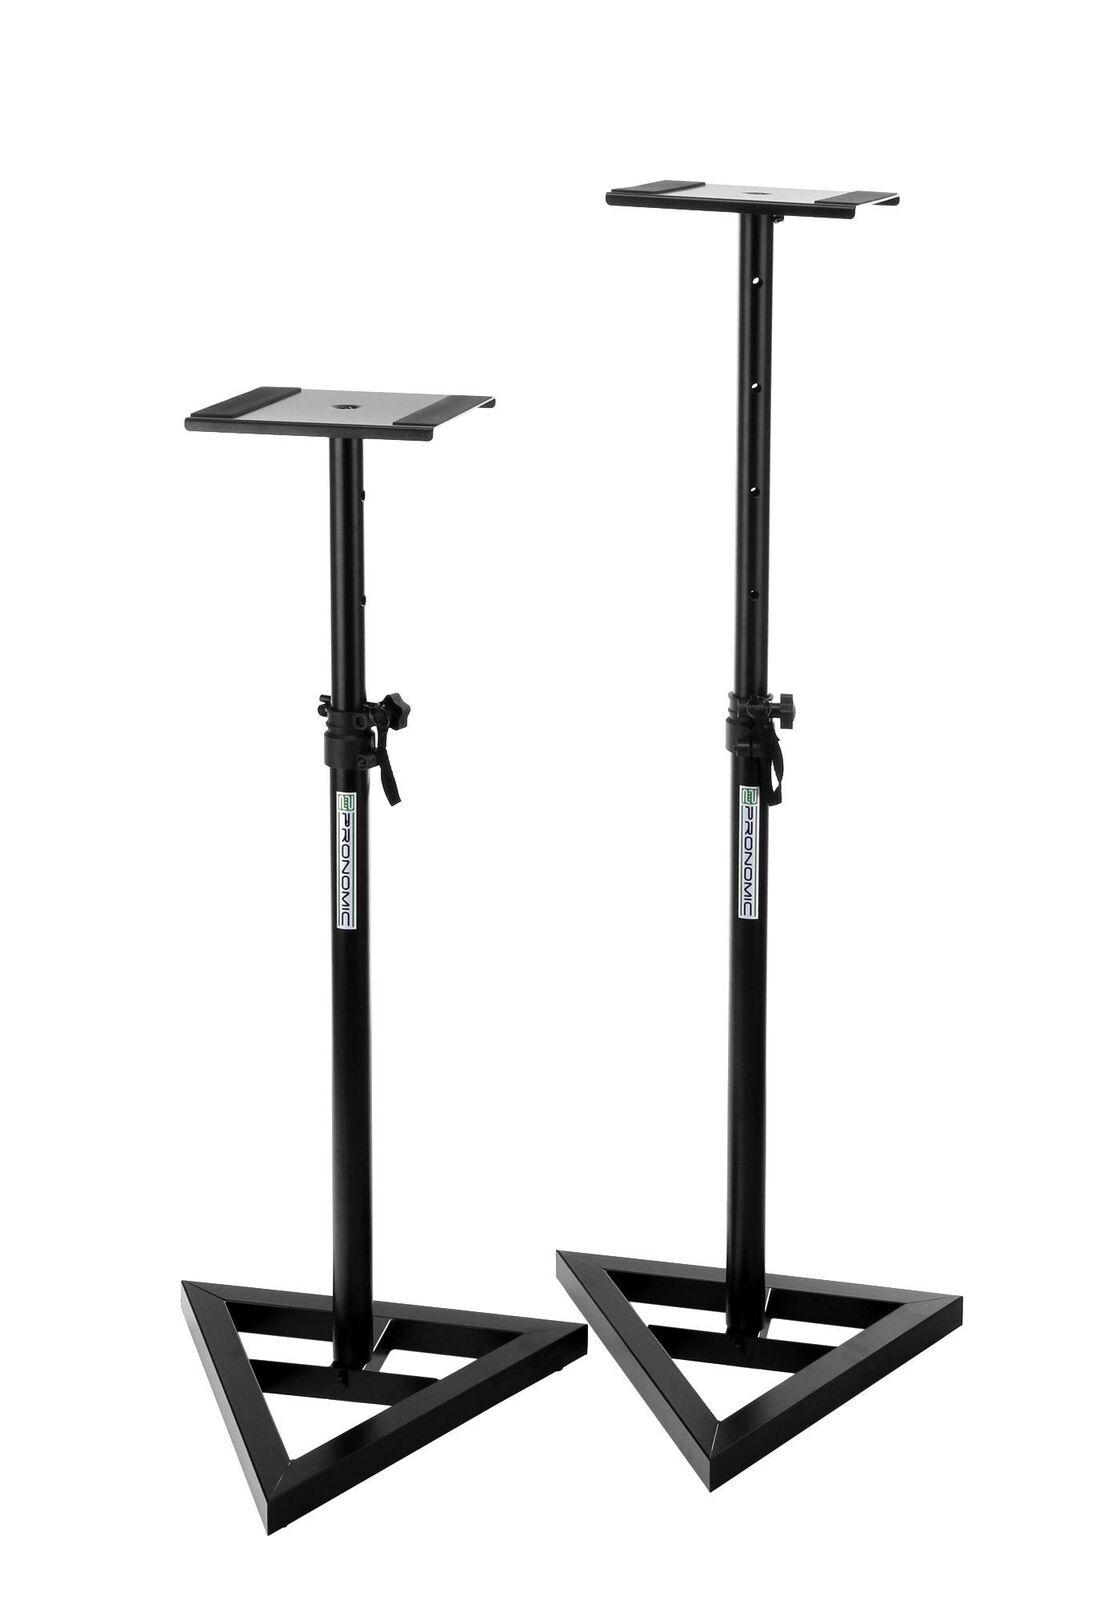 Pair Stable DJ PA HiFi Speaker Stands Studio Monitor Table Height Adjustable Set